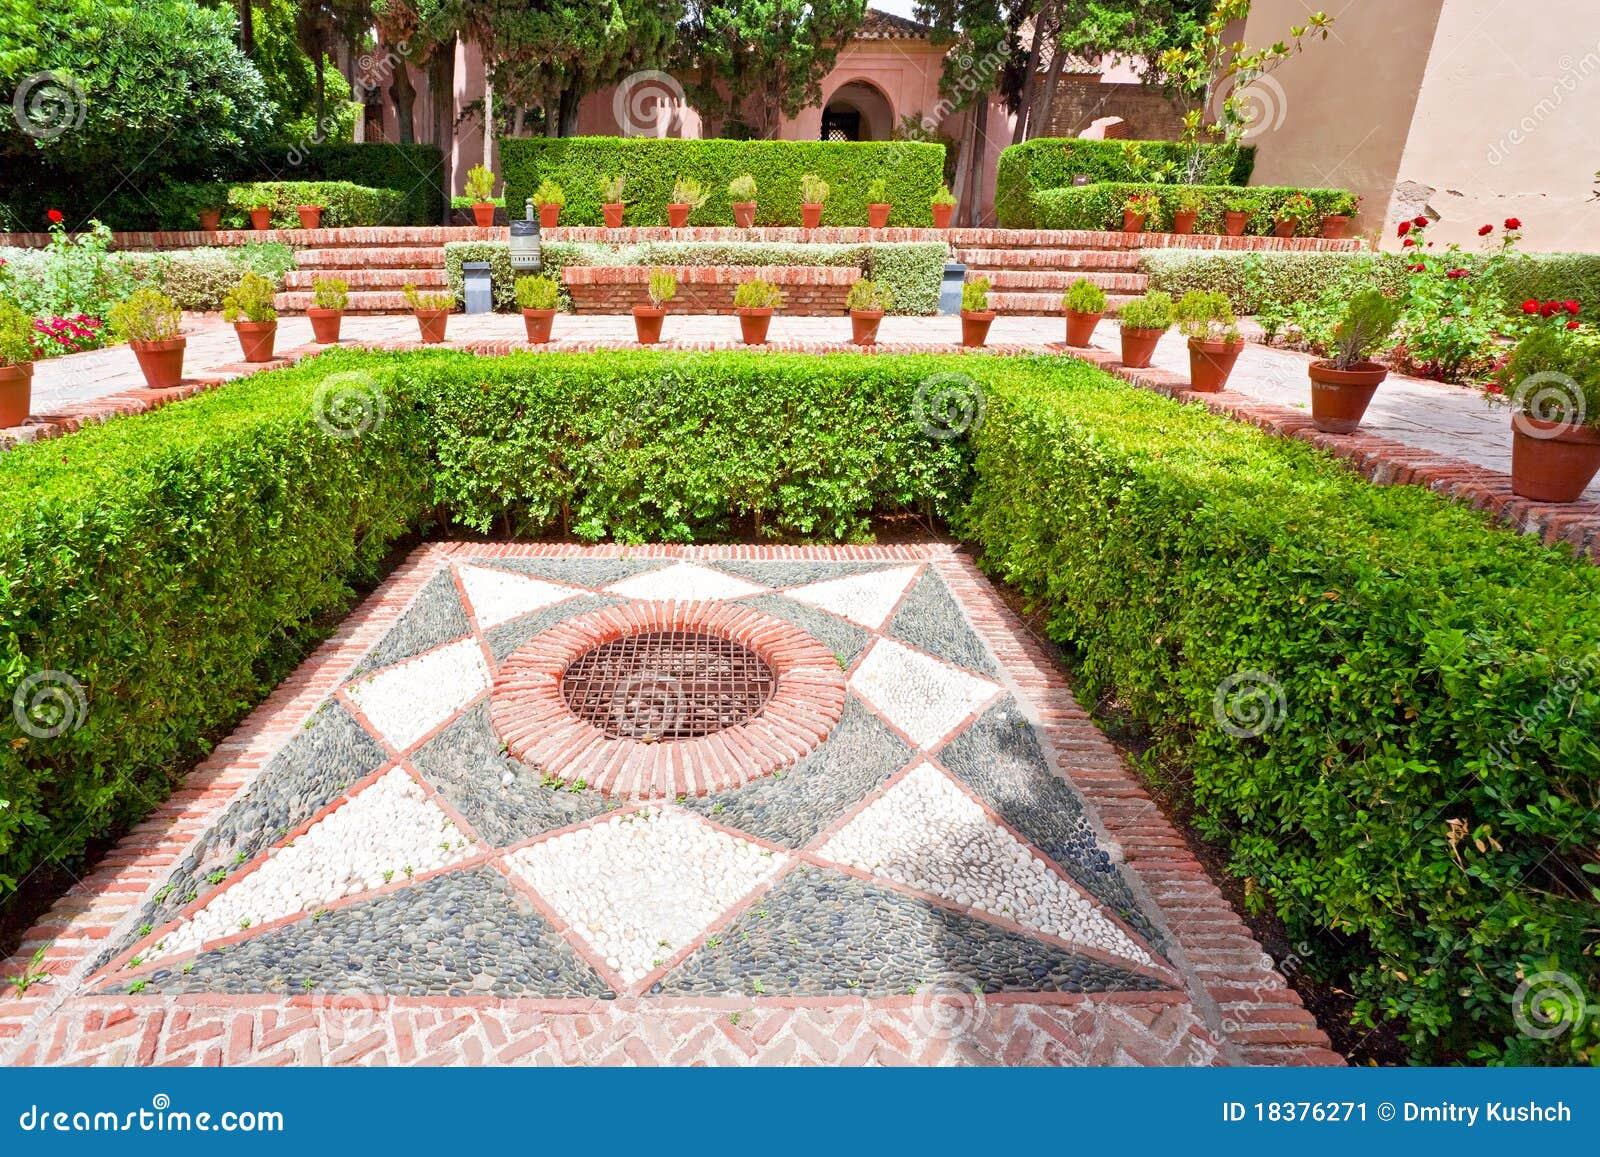 Dans le vieux jardin espagnol image stock image du for Jardin spanish